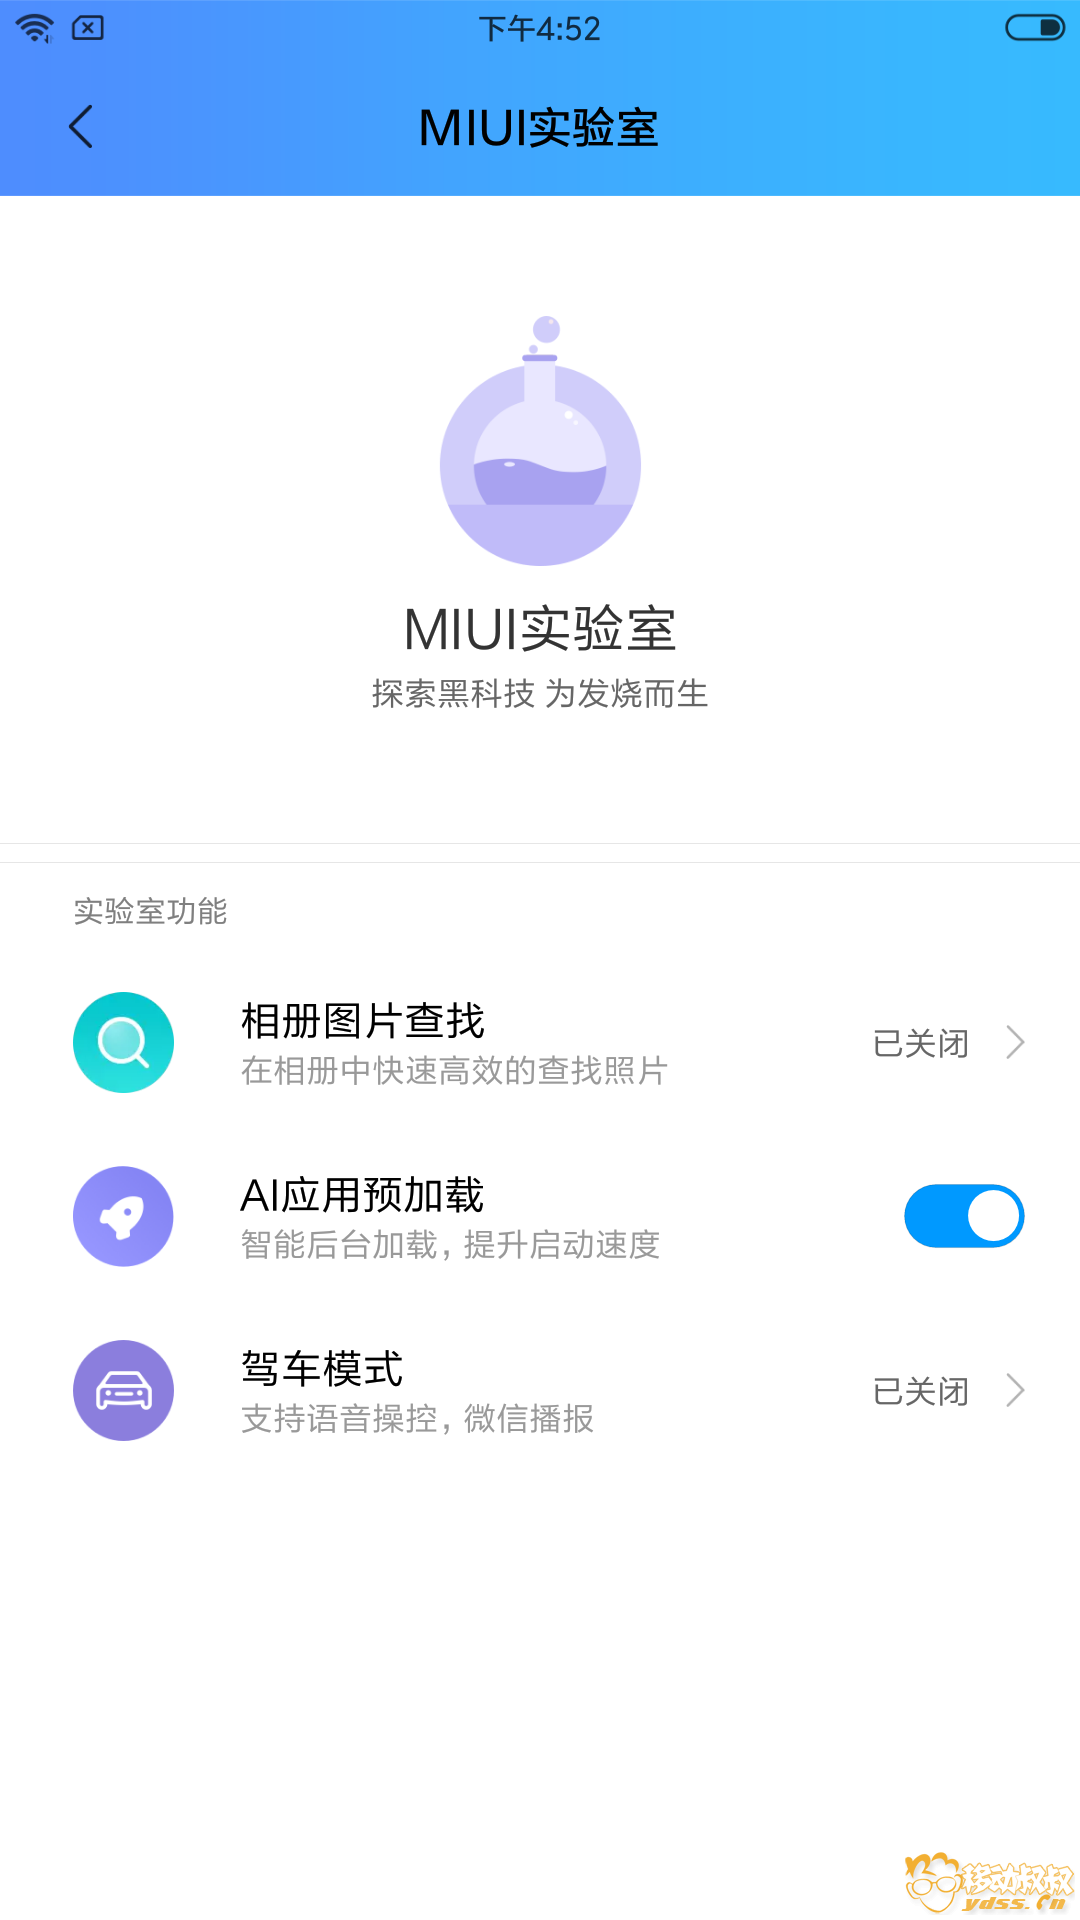 Screenshot_2018-08-21-16-52-01-392_com.android.settings.png